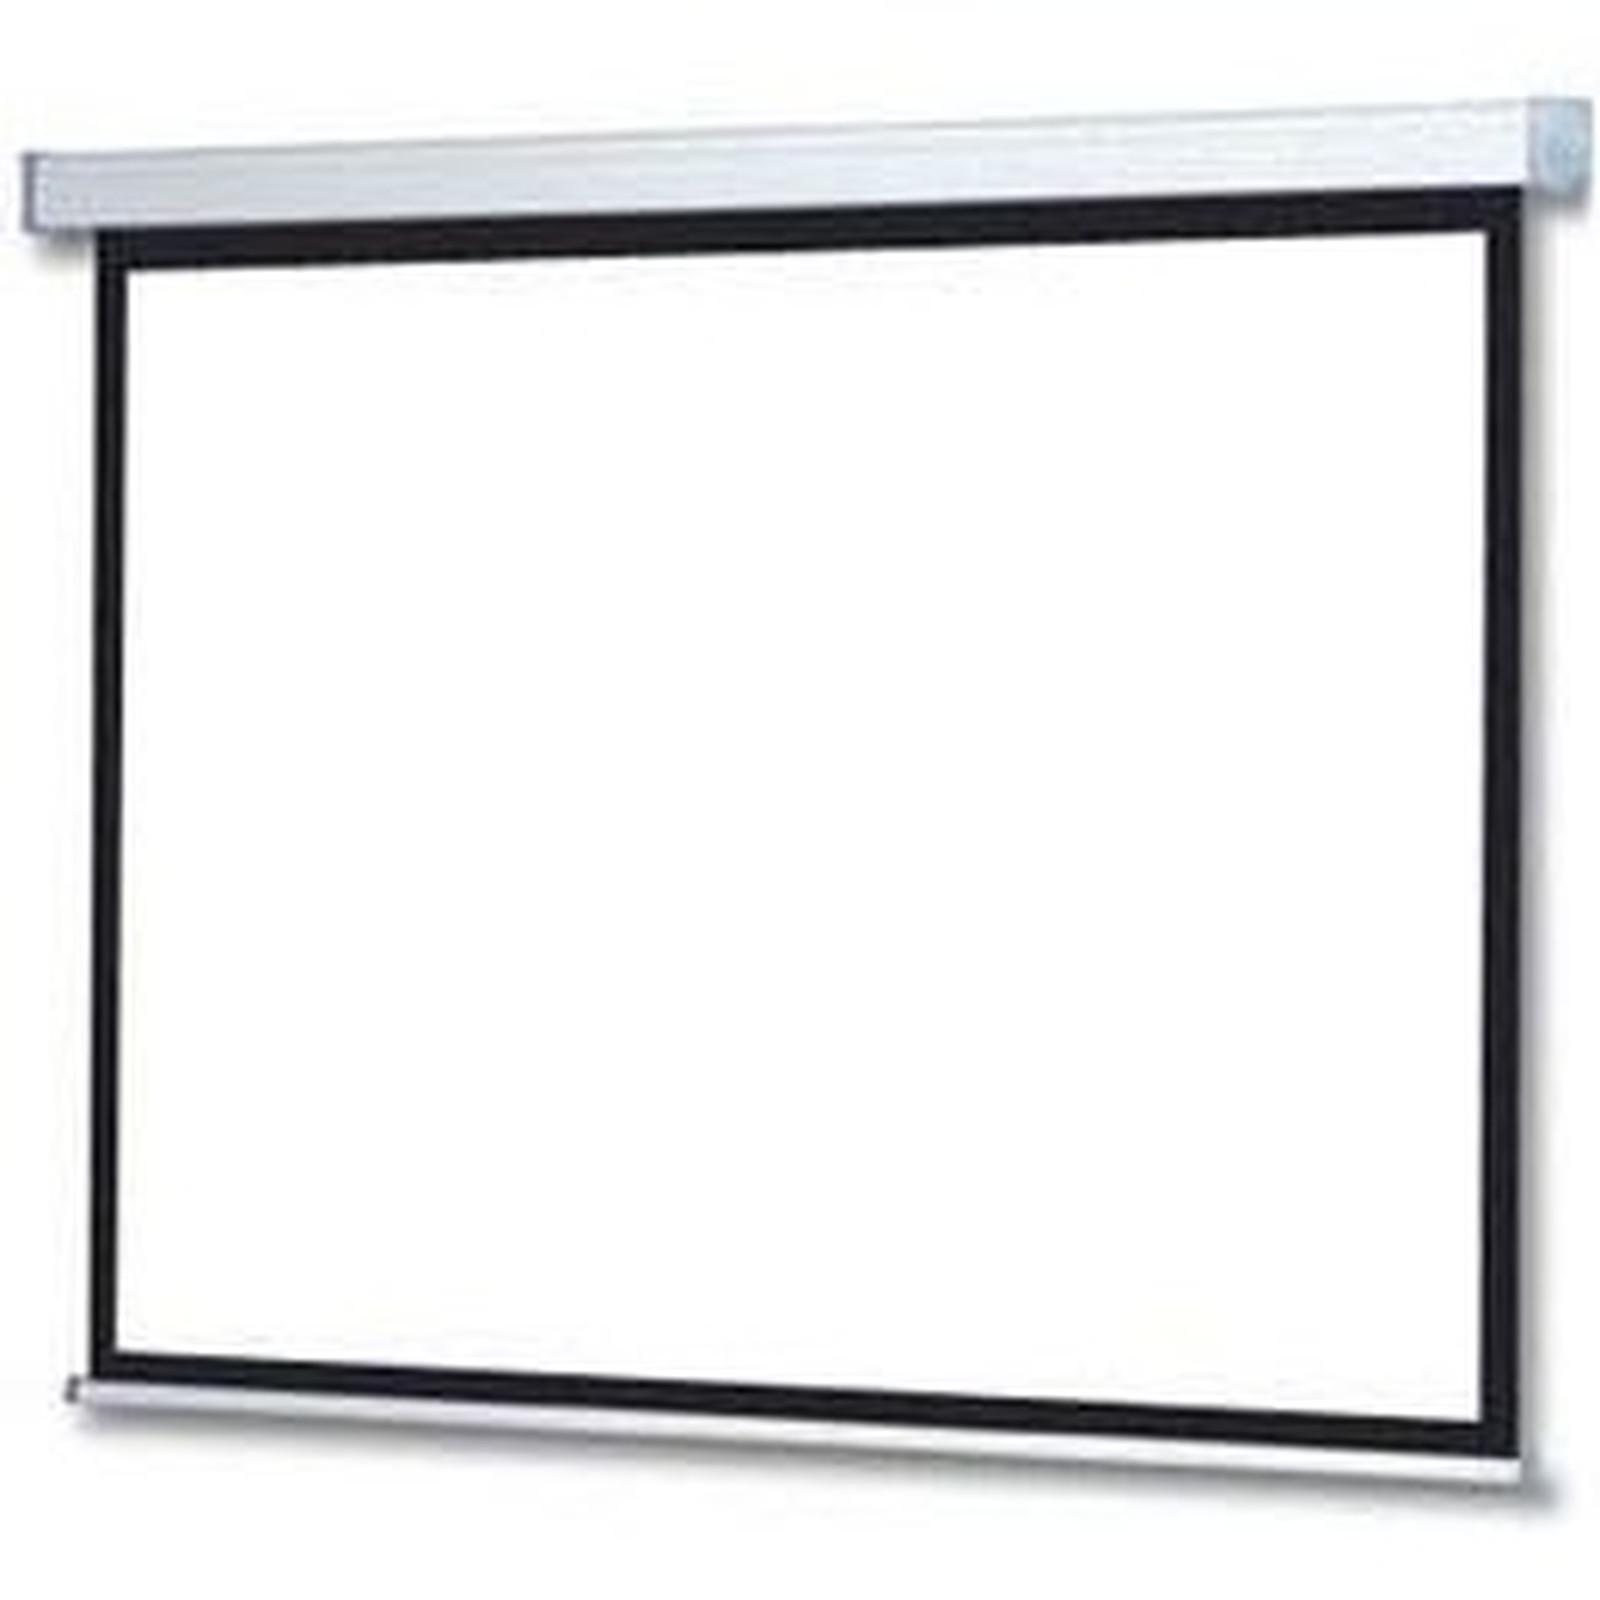 LDLC Ecran motorisé - Format 1:1 - 220 x 220 cm